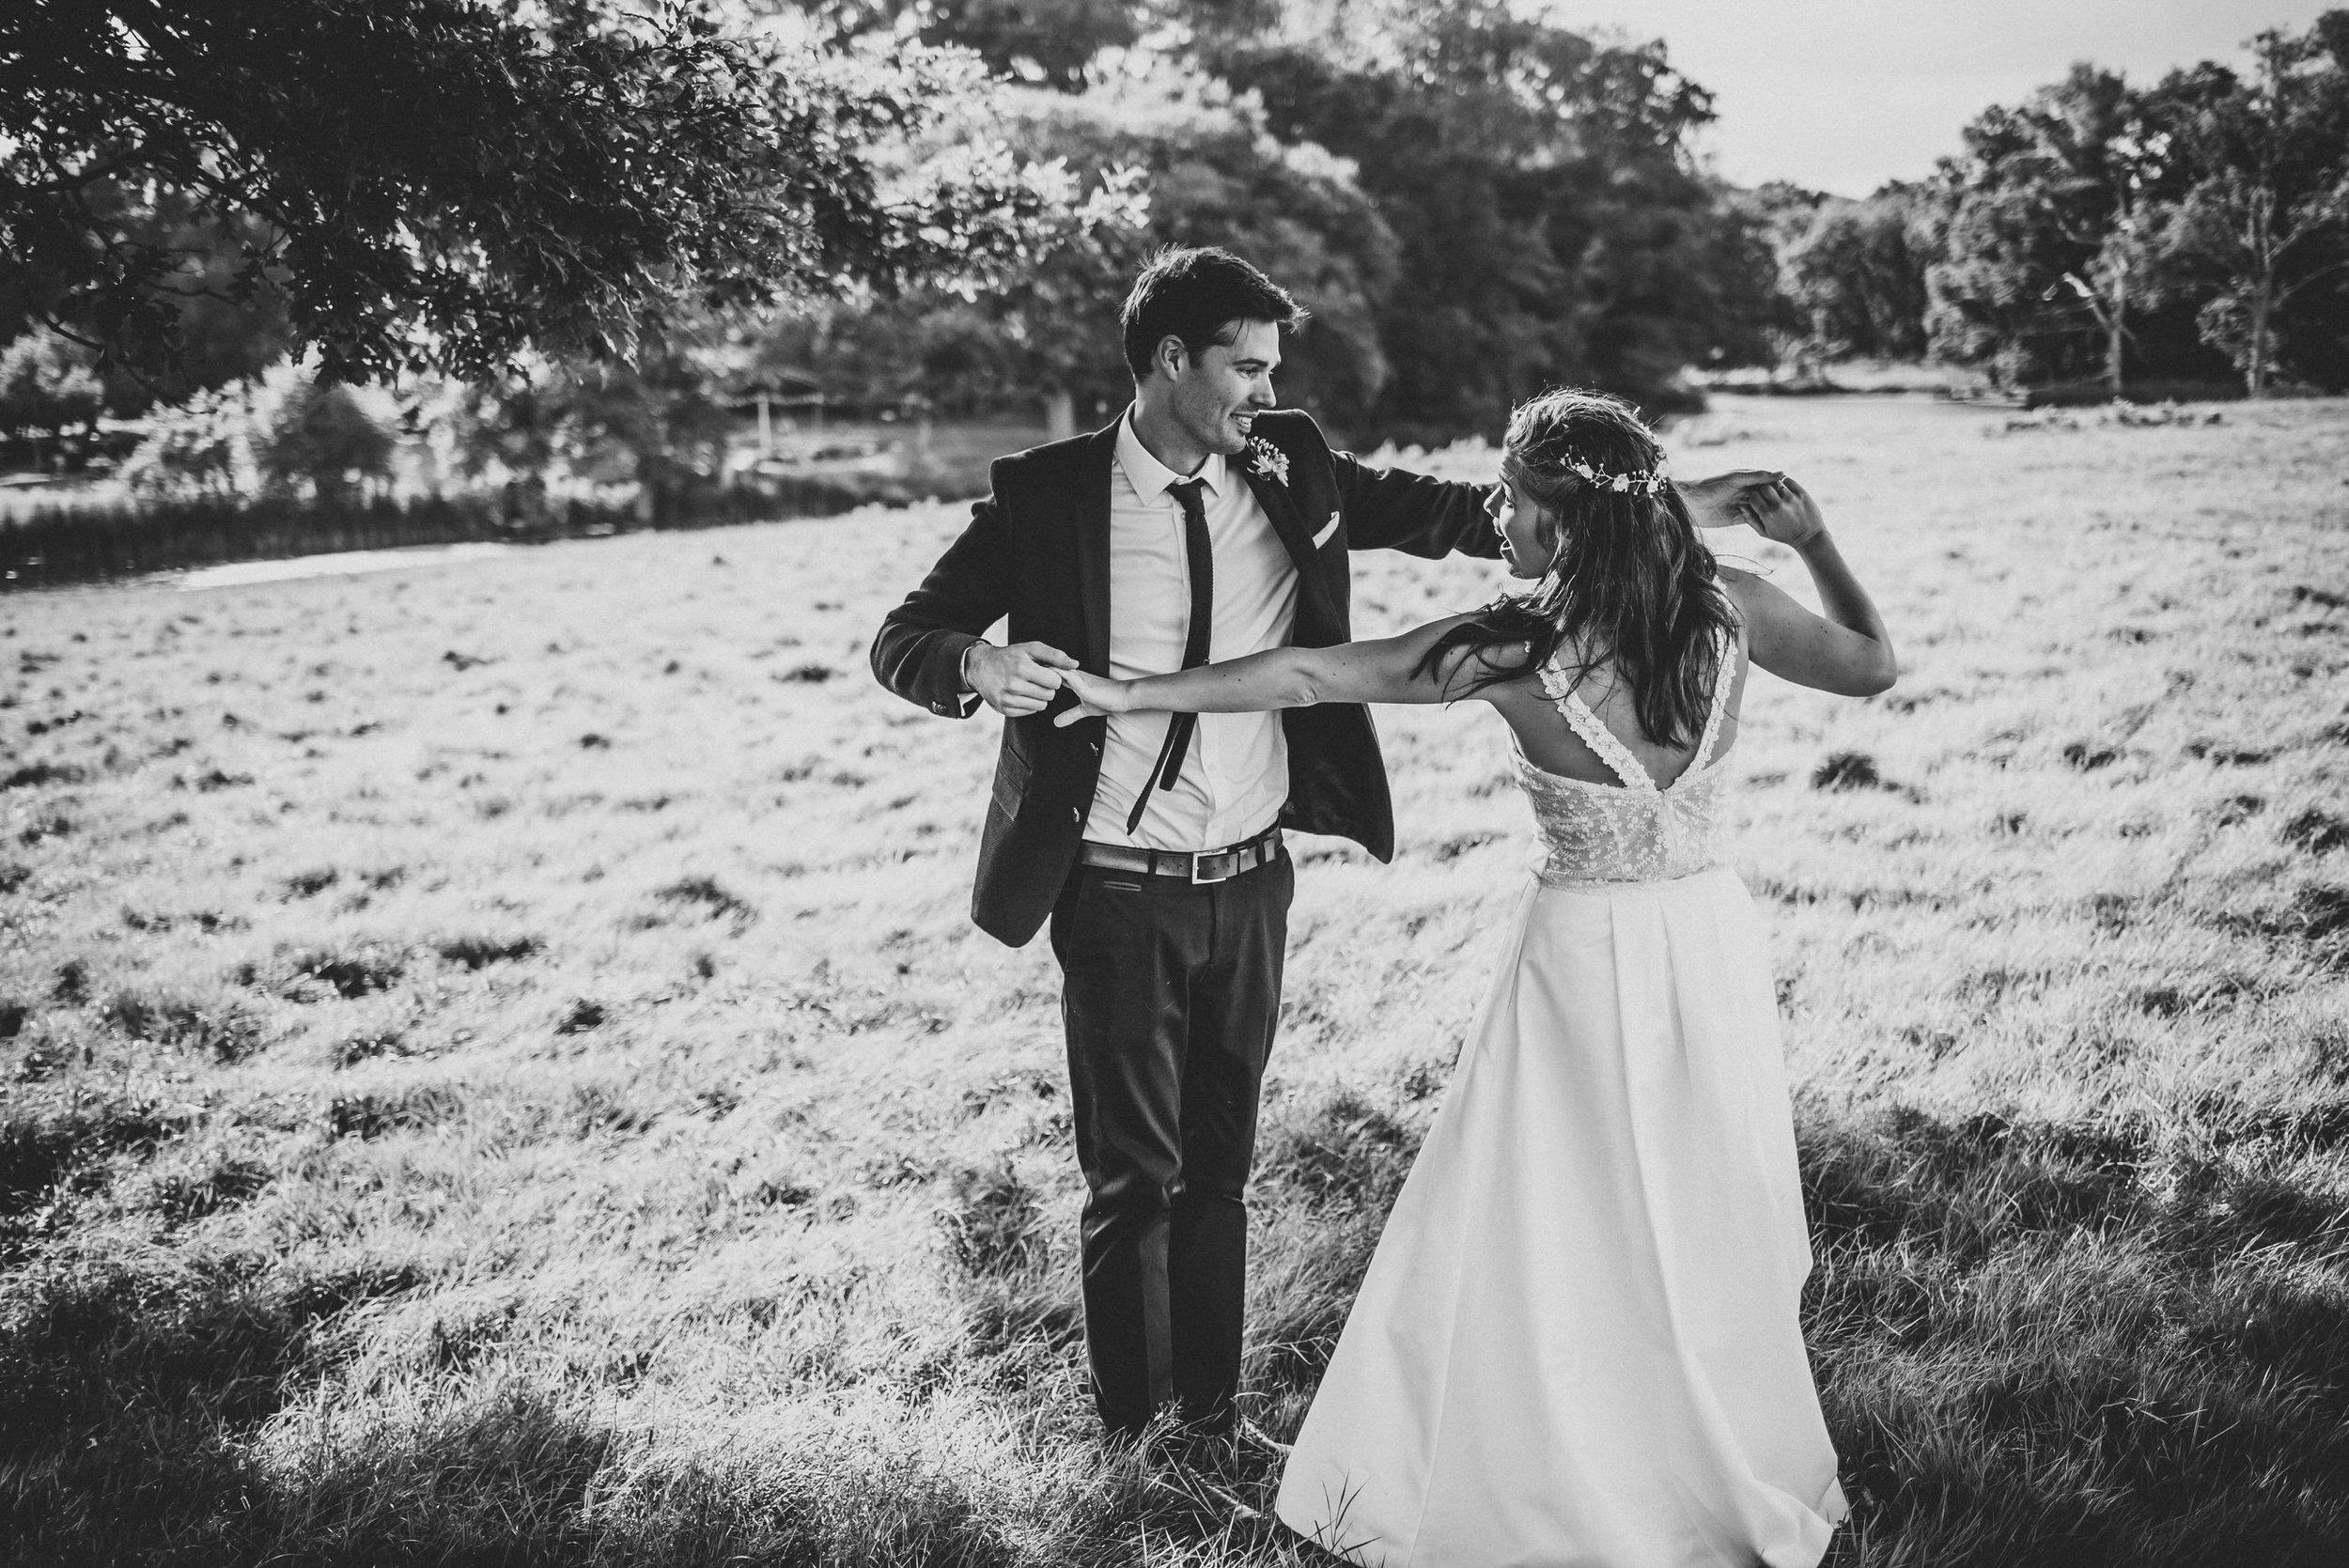 knepp-castle-boho-outdoor-wedding-411.jpg